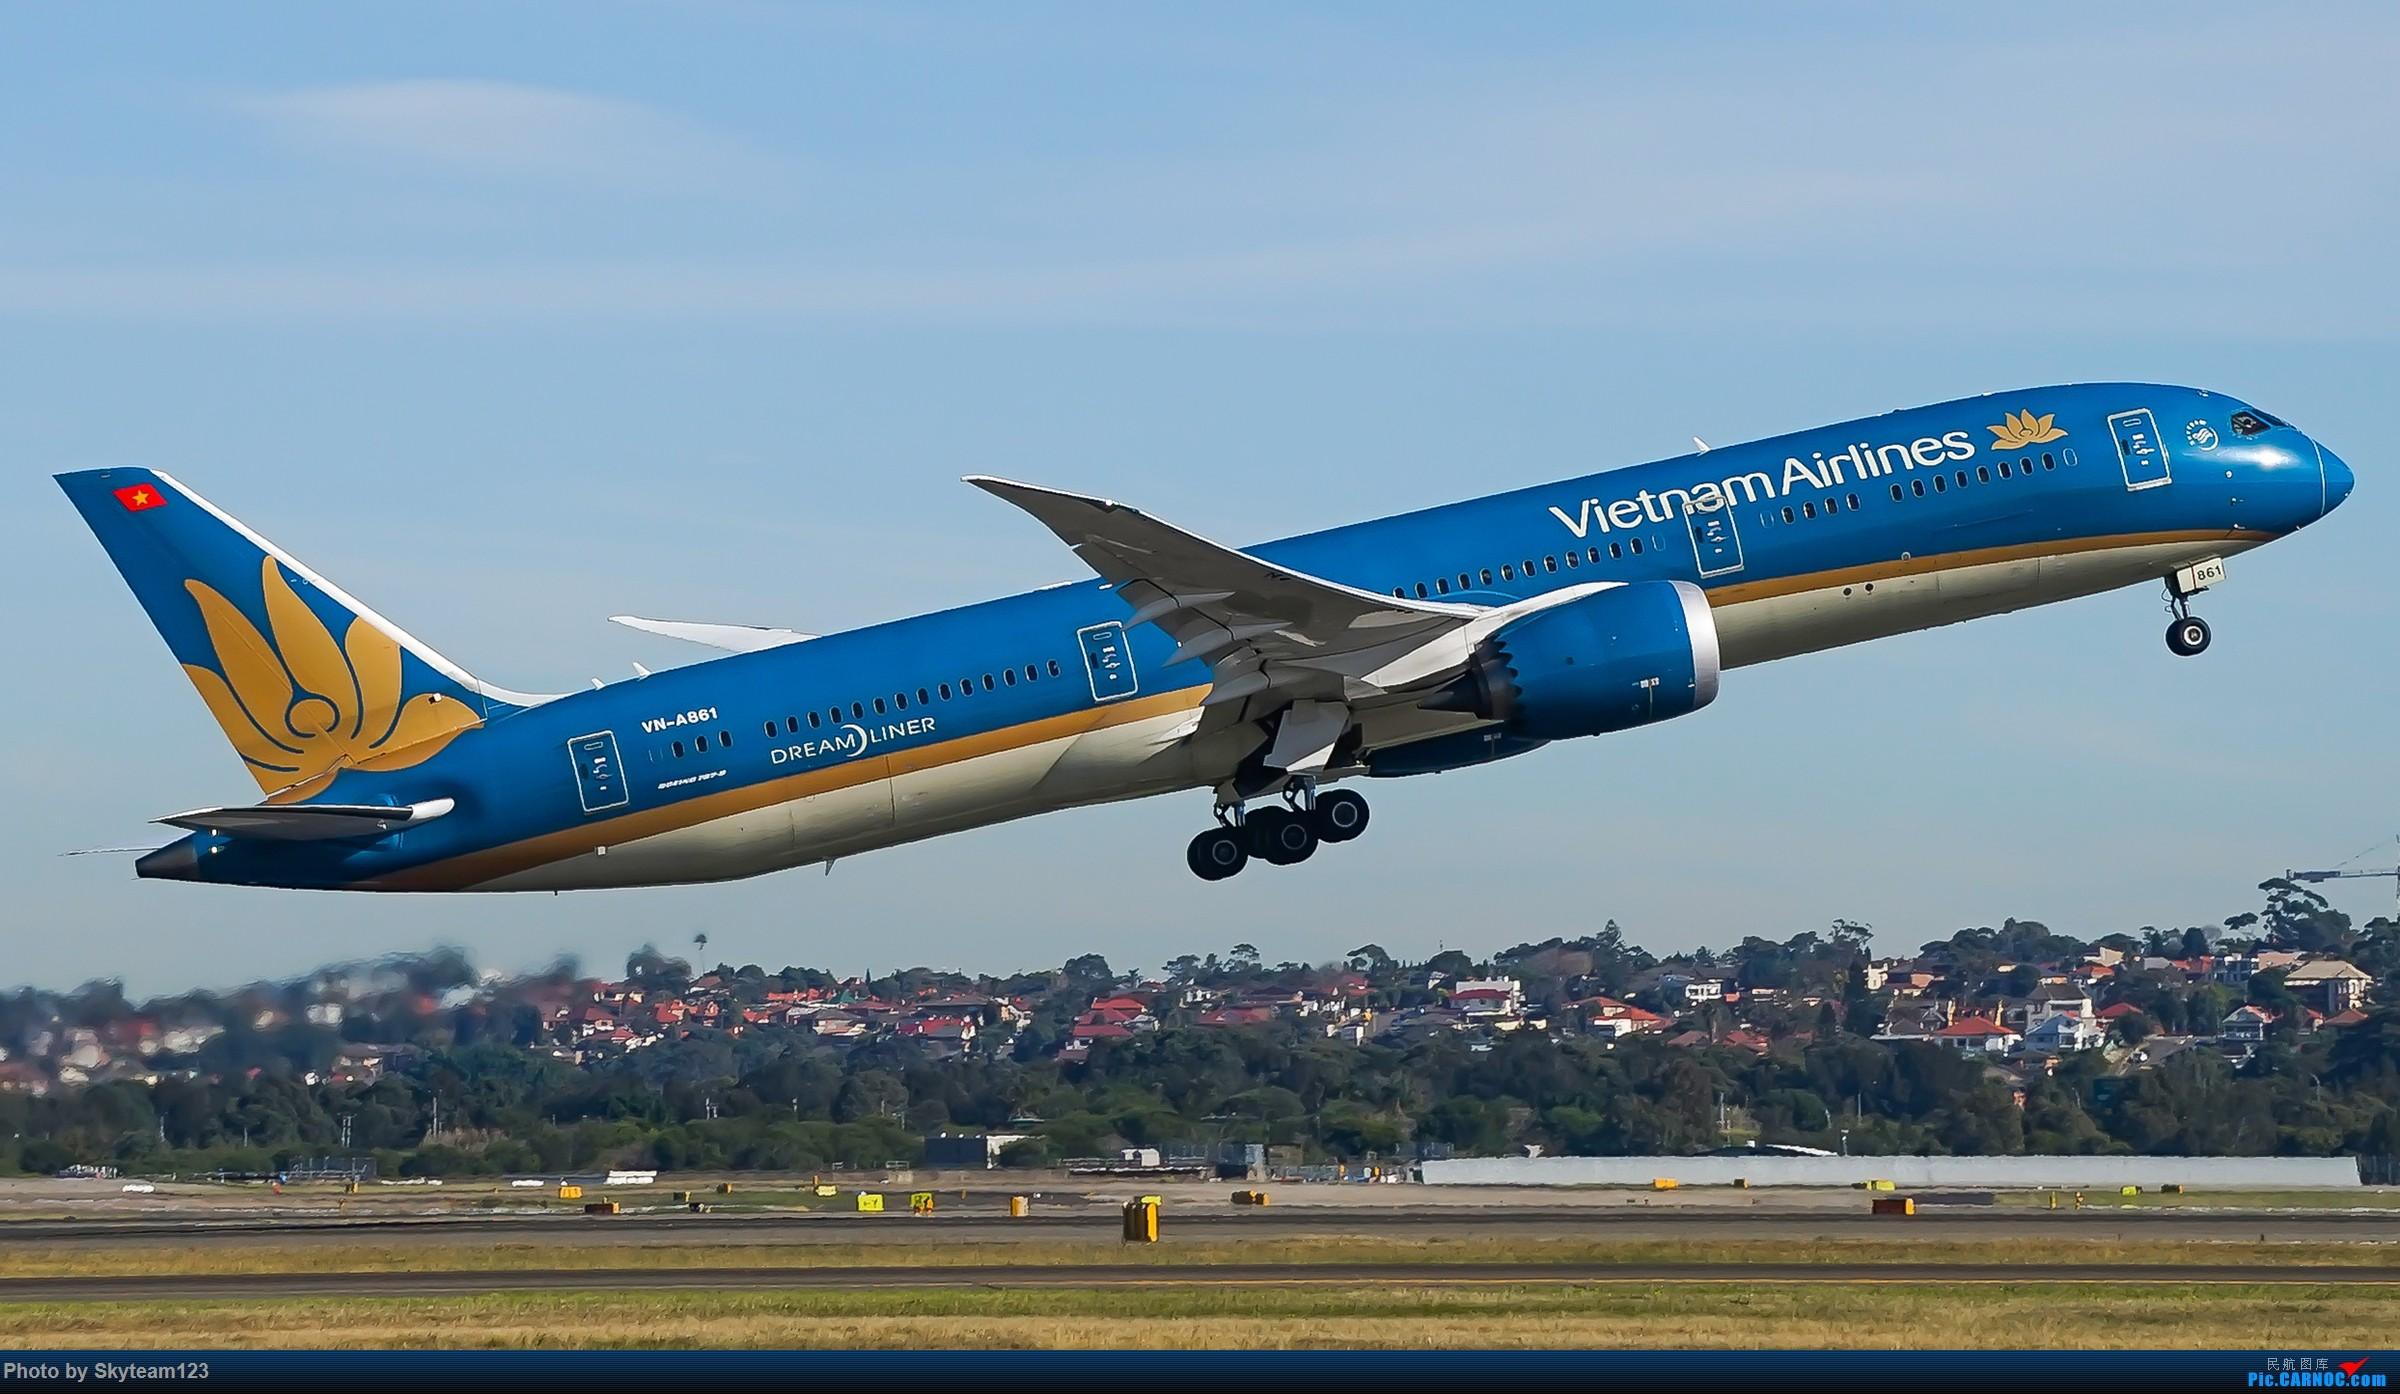 Re:[原创]【SYD】Blu EMU 停车场拍34L宽体起飞落地 BOEING 787-9 VN-A861 澳大利亚悉尼金斯福德·史密斯机场